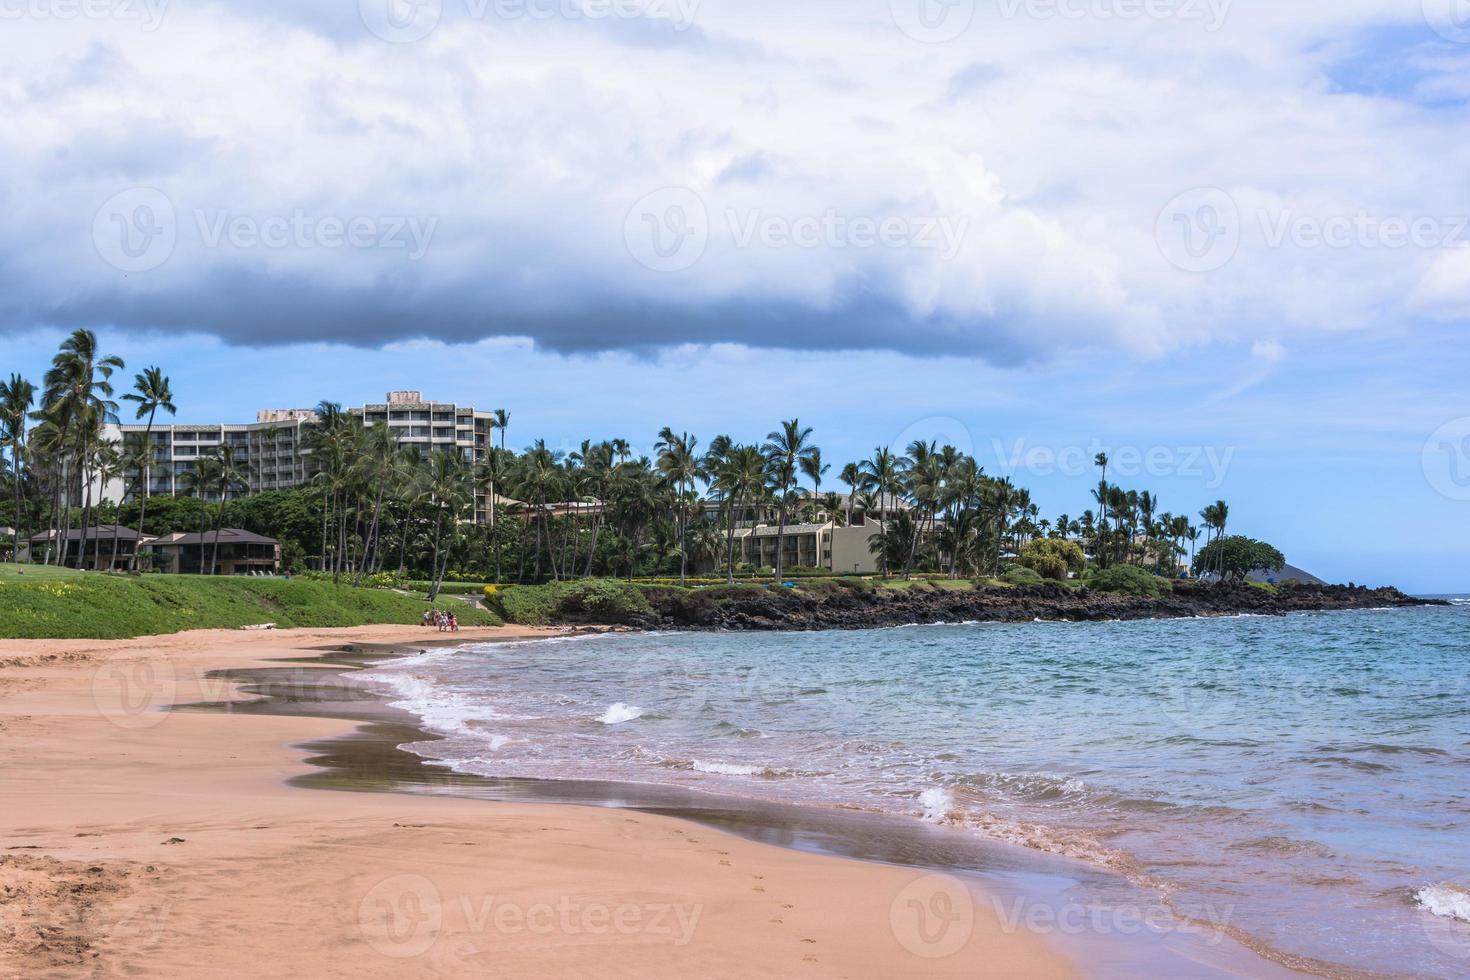 The sand beach at Wailea in Maui, Hawaii photo